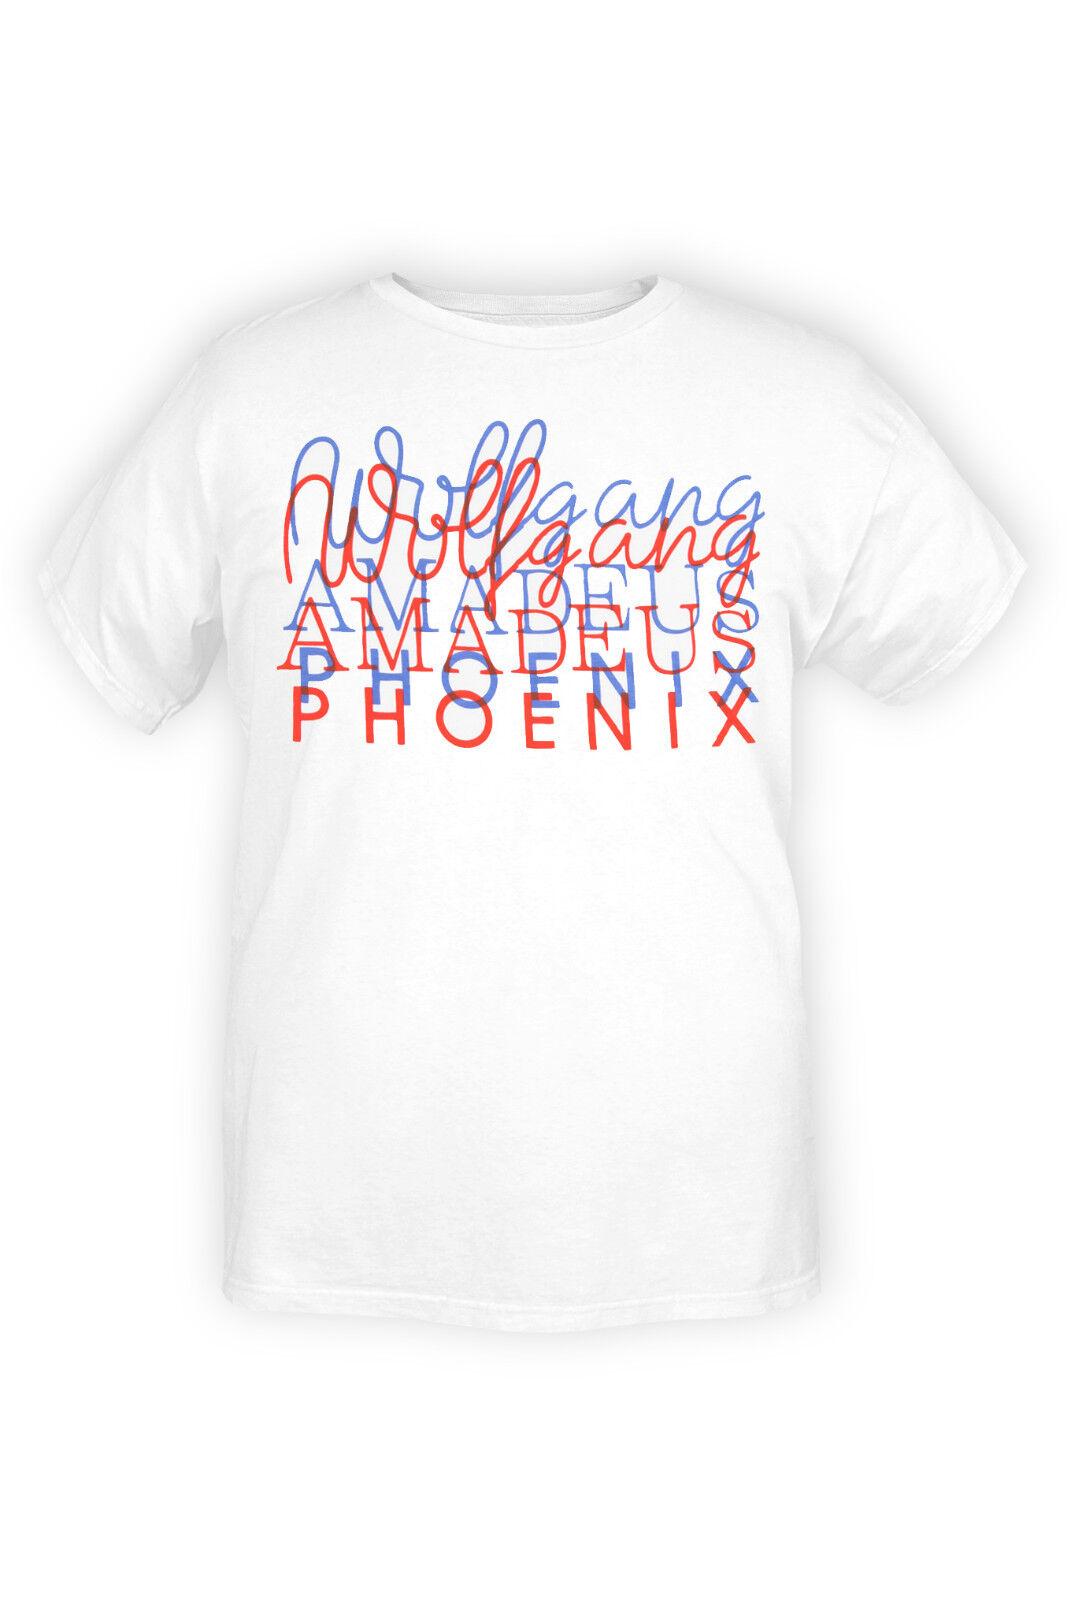 NW//OT Women/'s Phoenix Crew Neck Long Night Shirt 3XL Blk